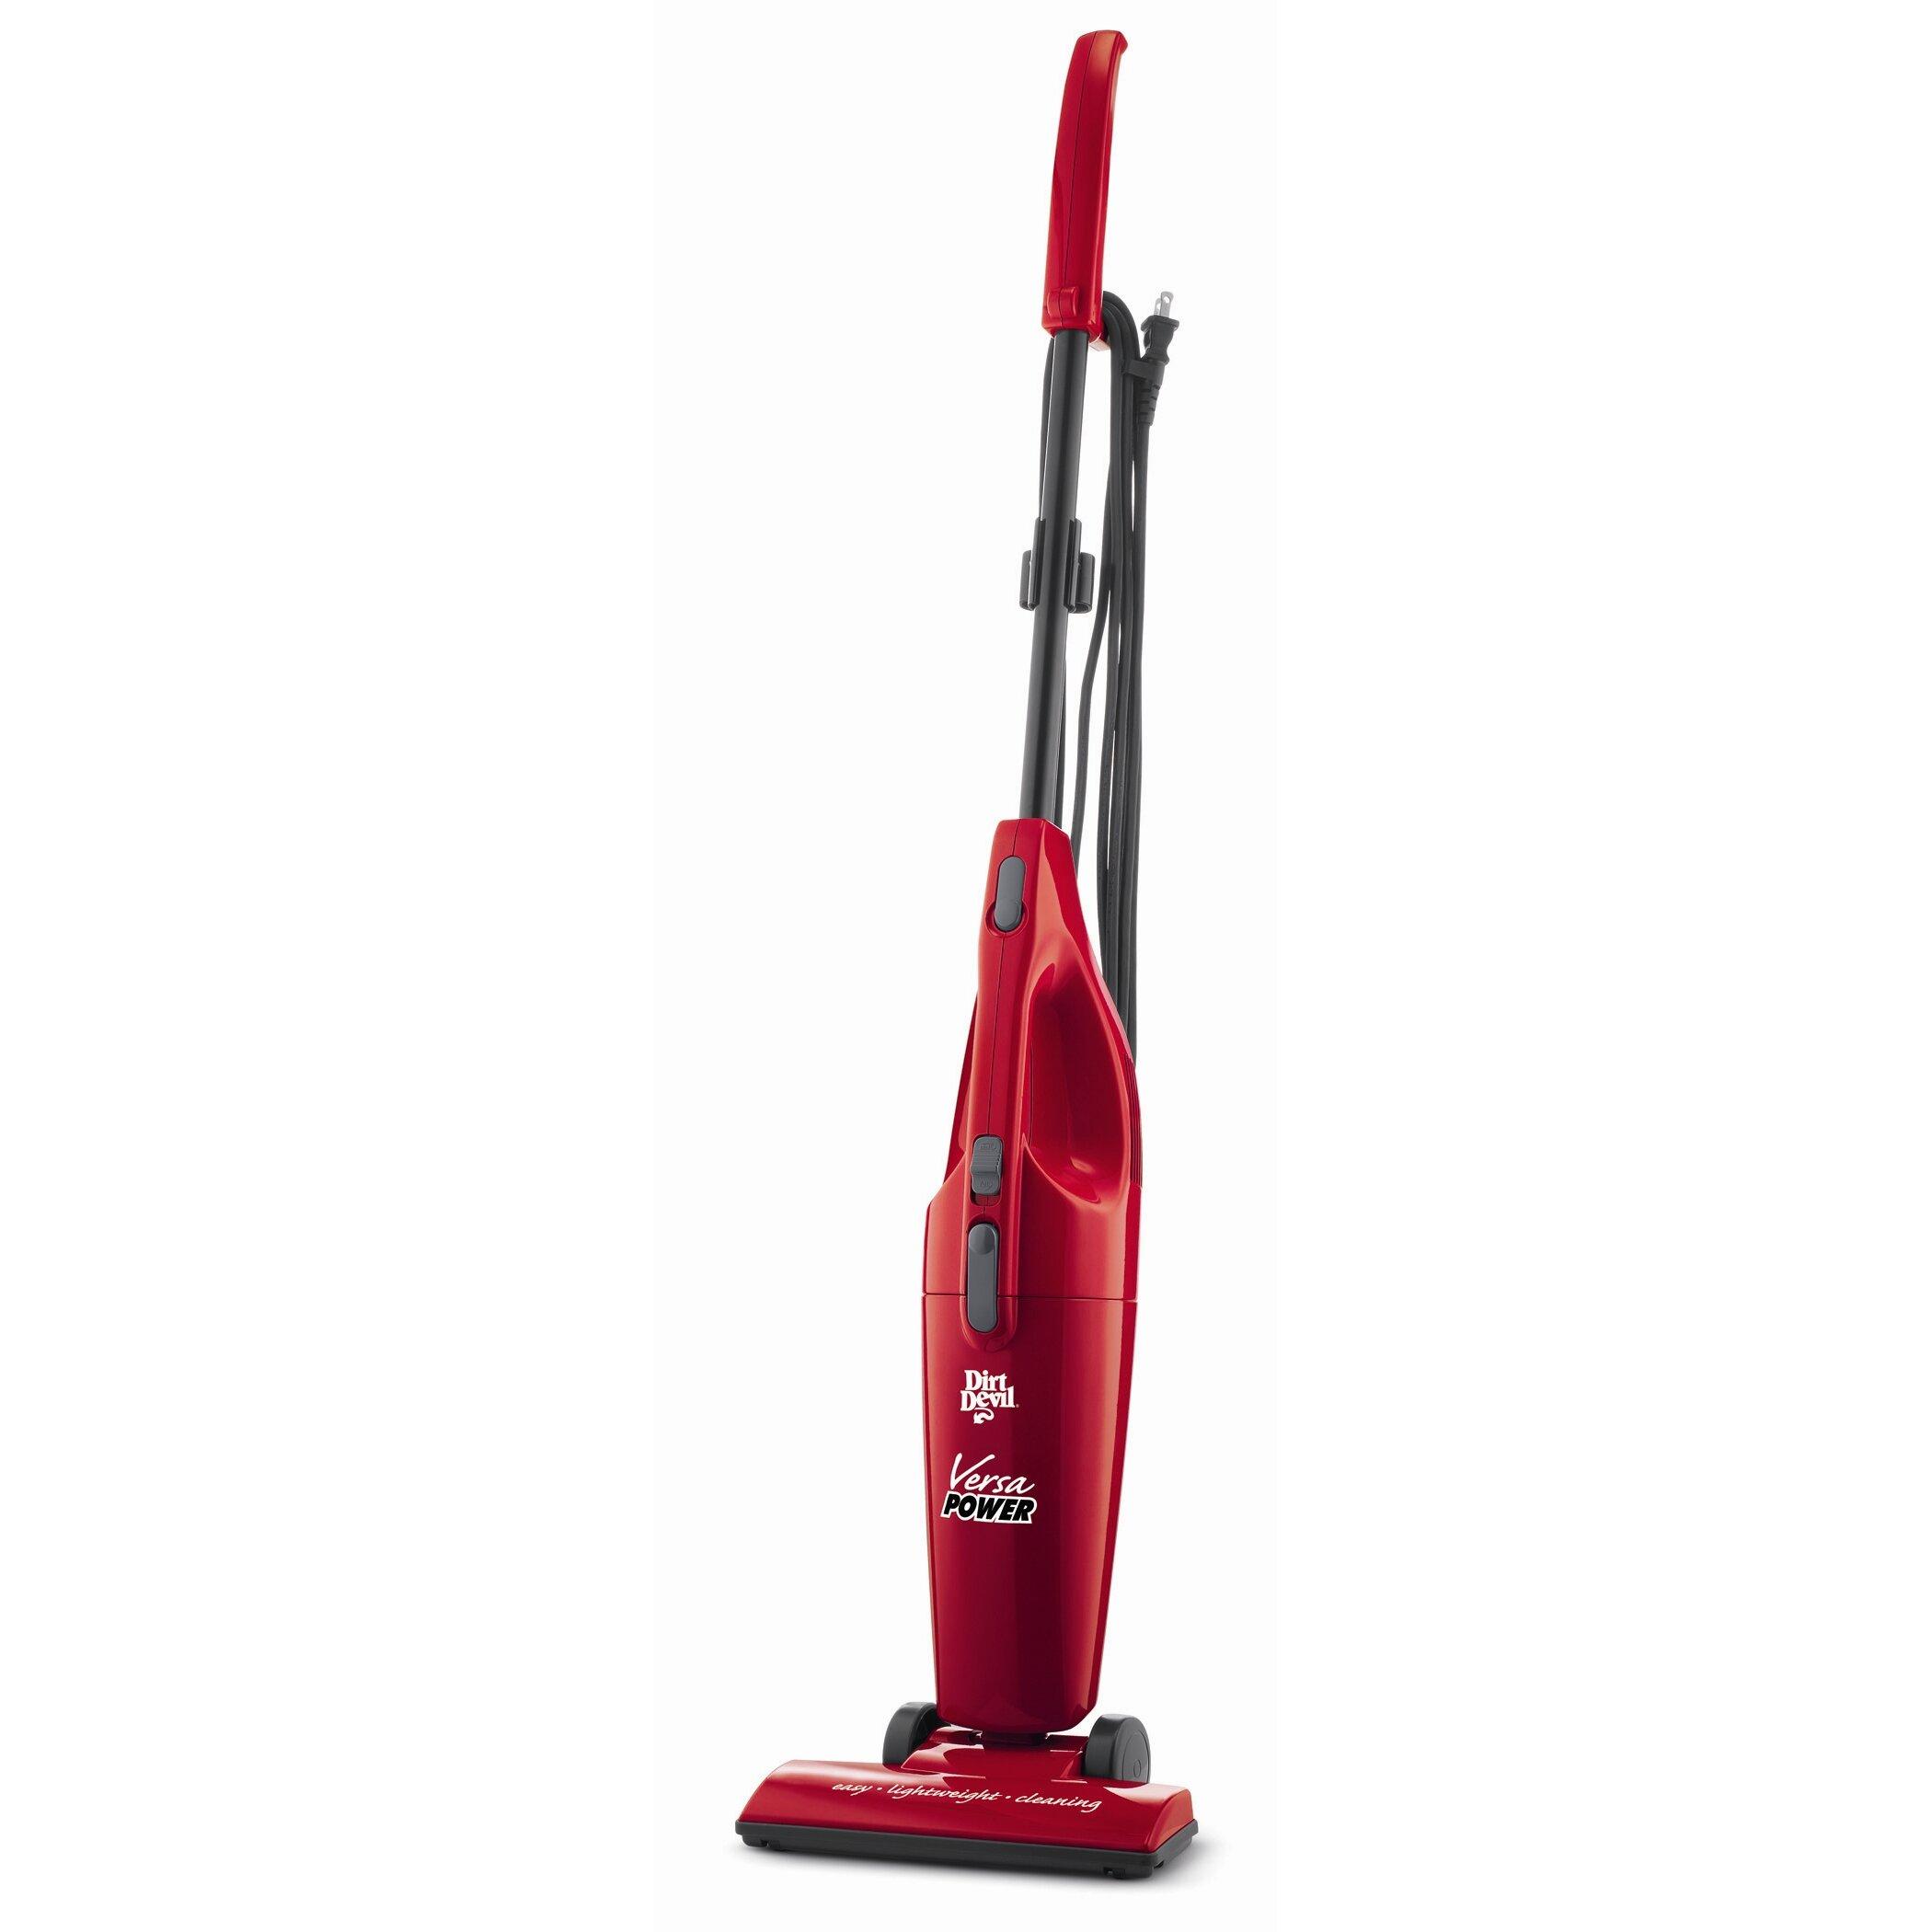 Amazon.com: Customer reviews: Dirt Devil Versa Power Clean ...